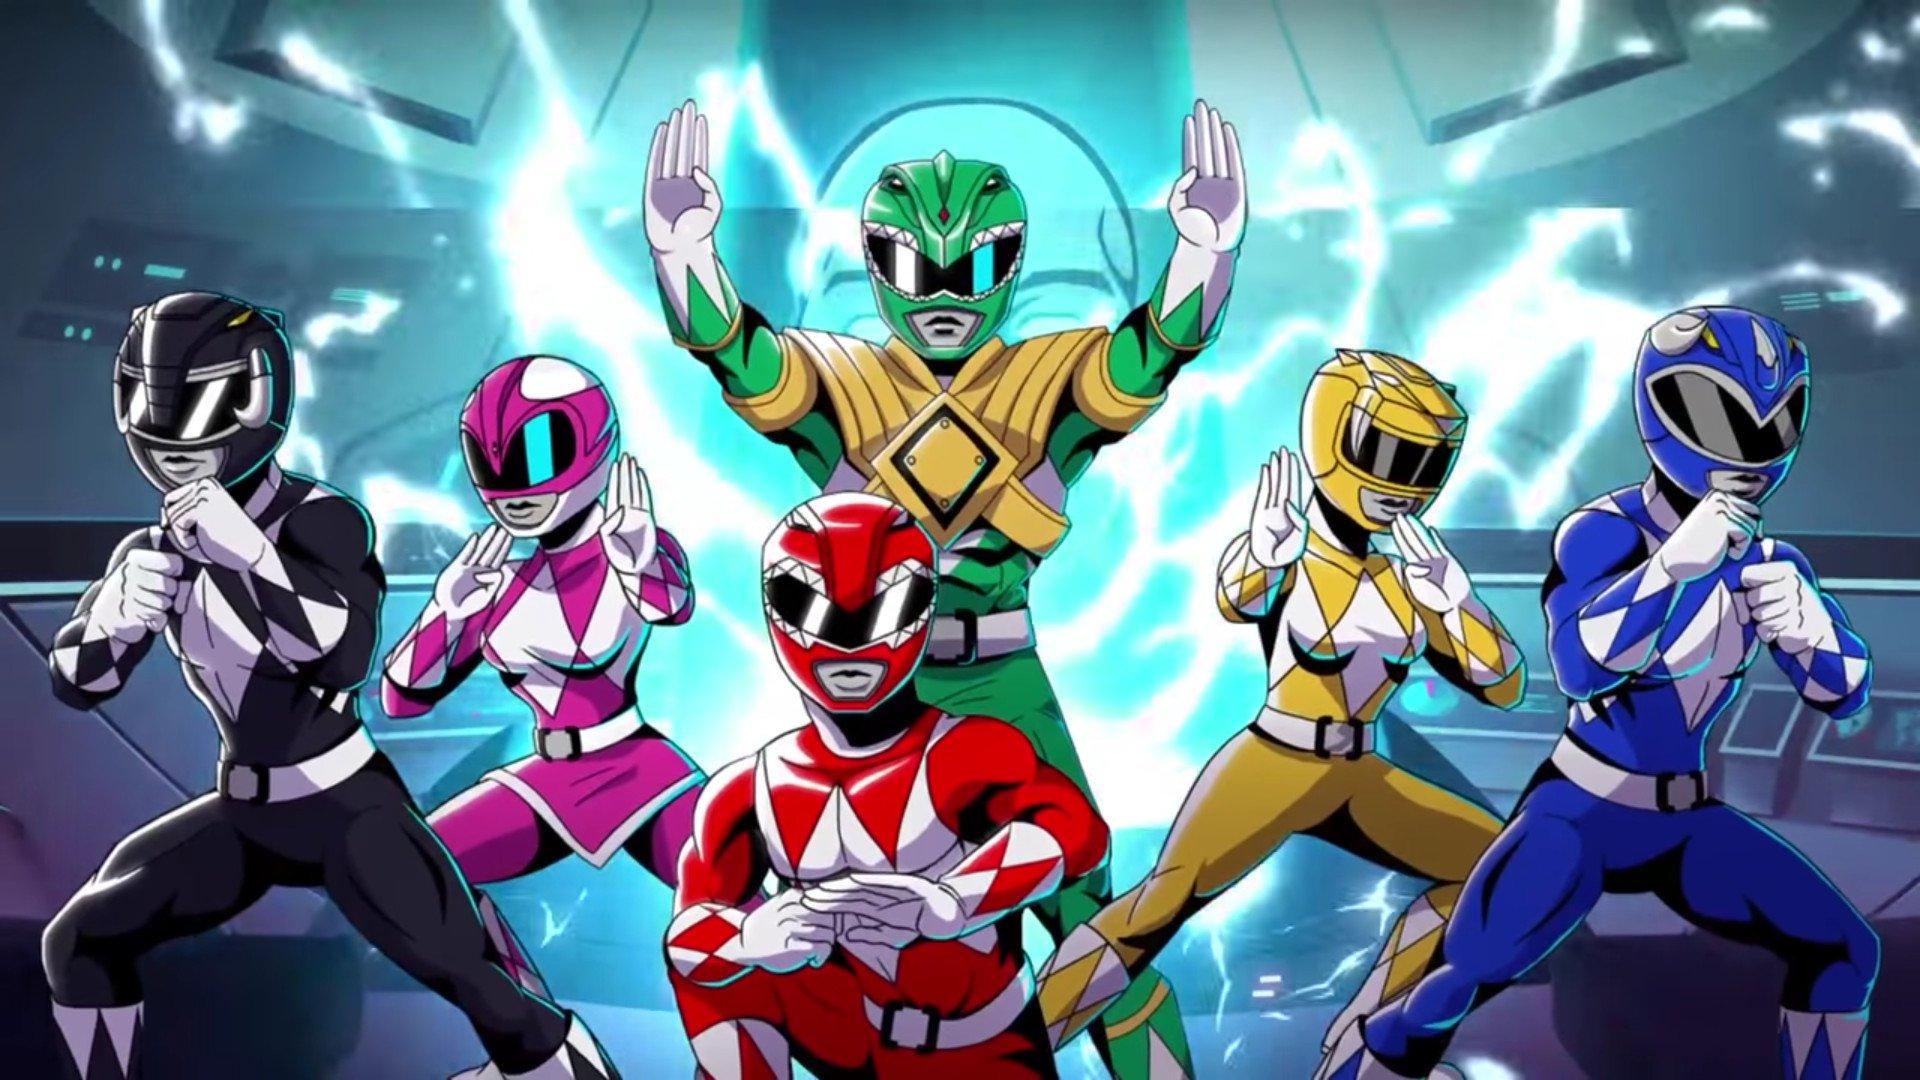 Mighty Morphin Power Rangers Iphone Wallpaper Mighty Morphin Power Rangers Mega Battle Hd Wallpaper